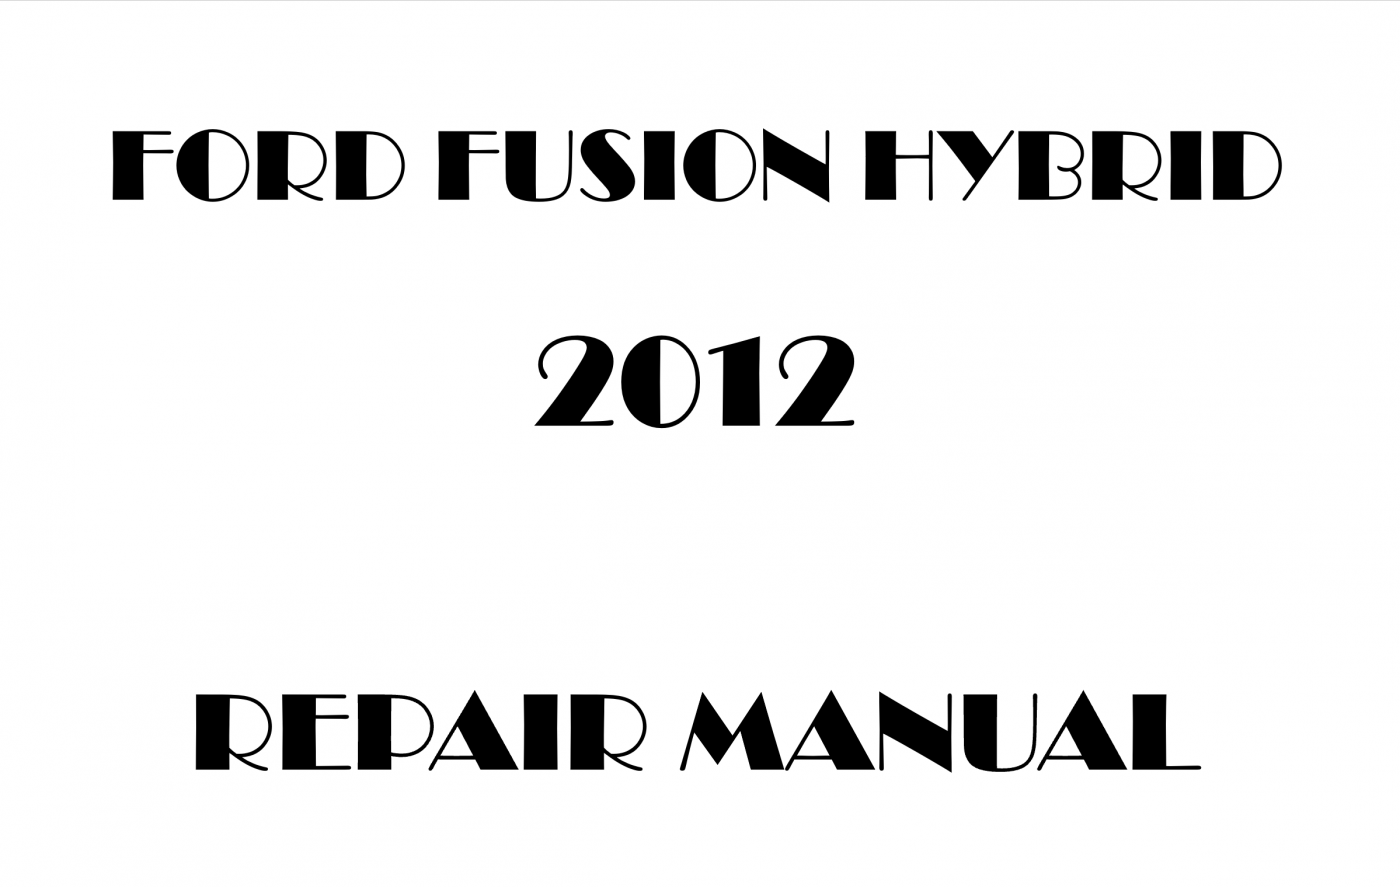 2012 Ford Fusion Hybrid repair manual